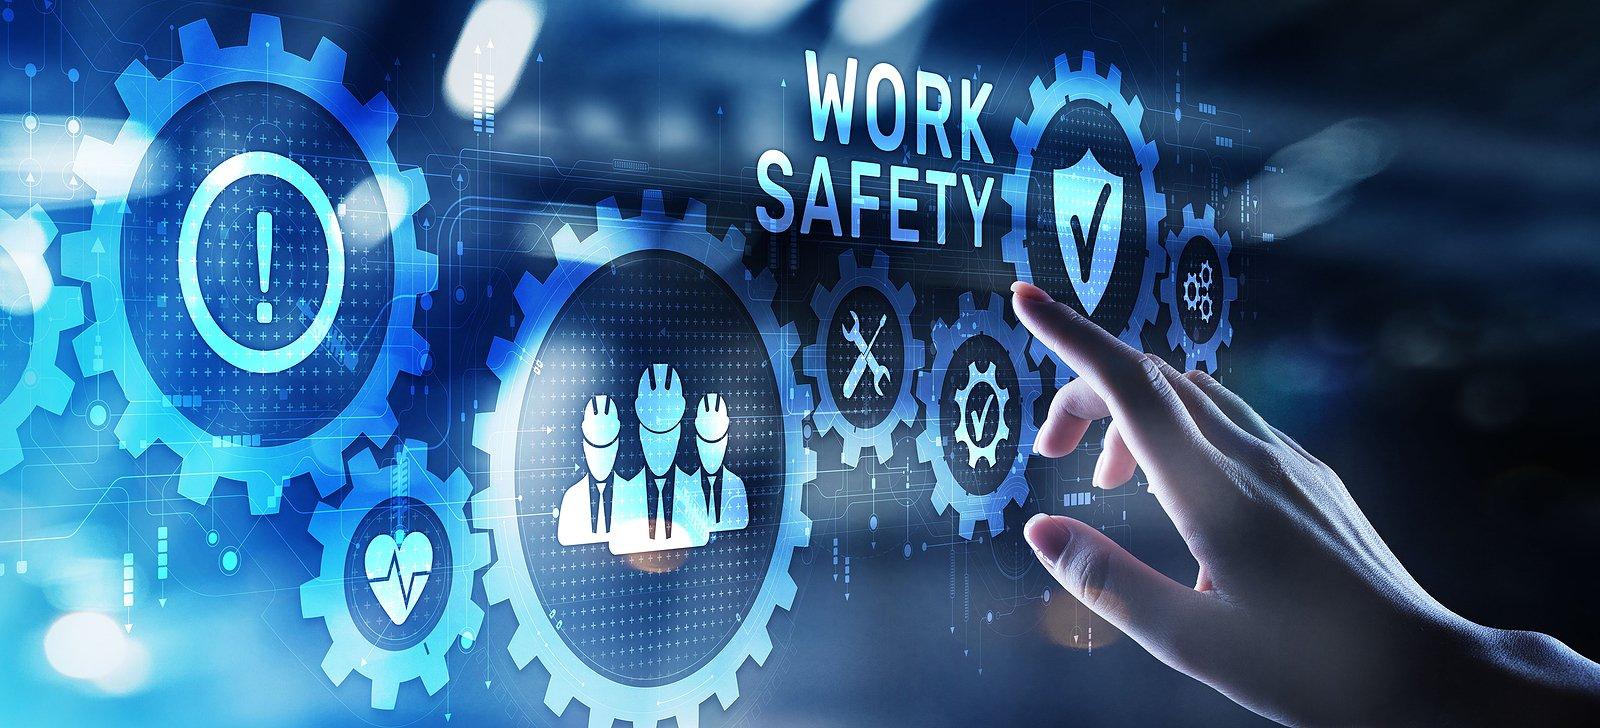 bigstock-Work-Safety-Hse-Regulation-Rul-419989240